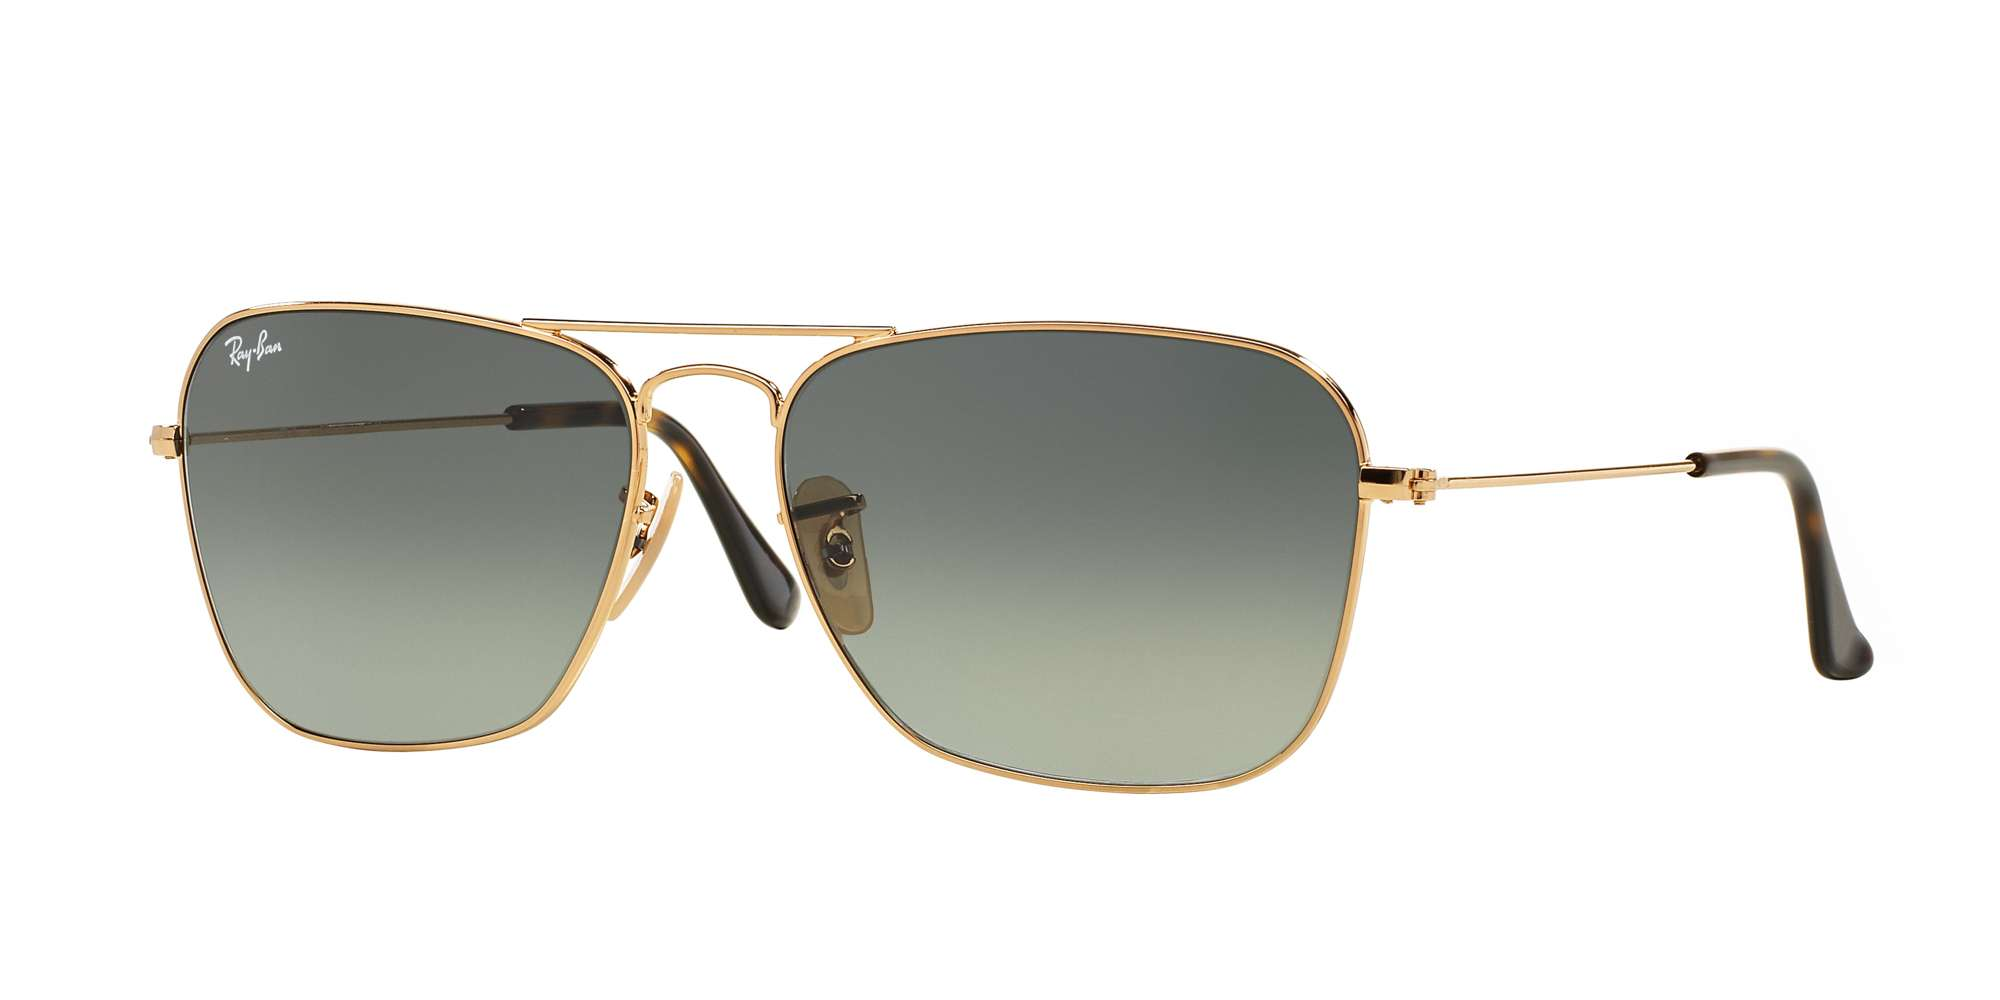 GOLD / LIGHT GREY GRADIENT DARK GREY lenses